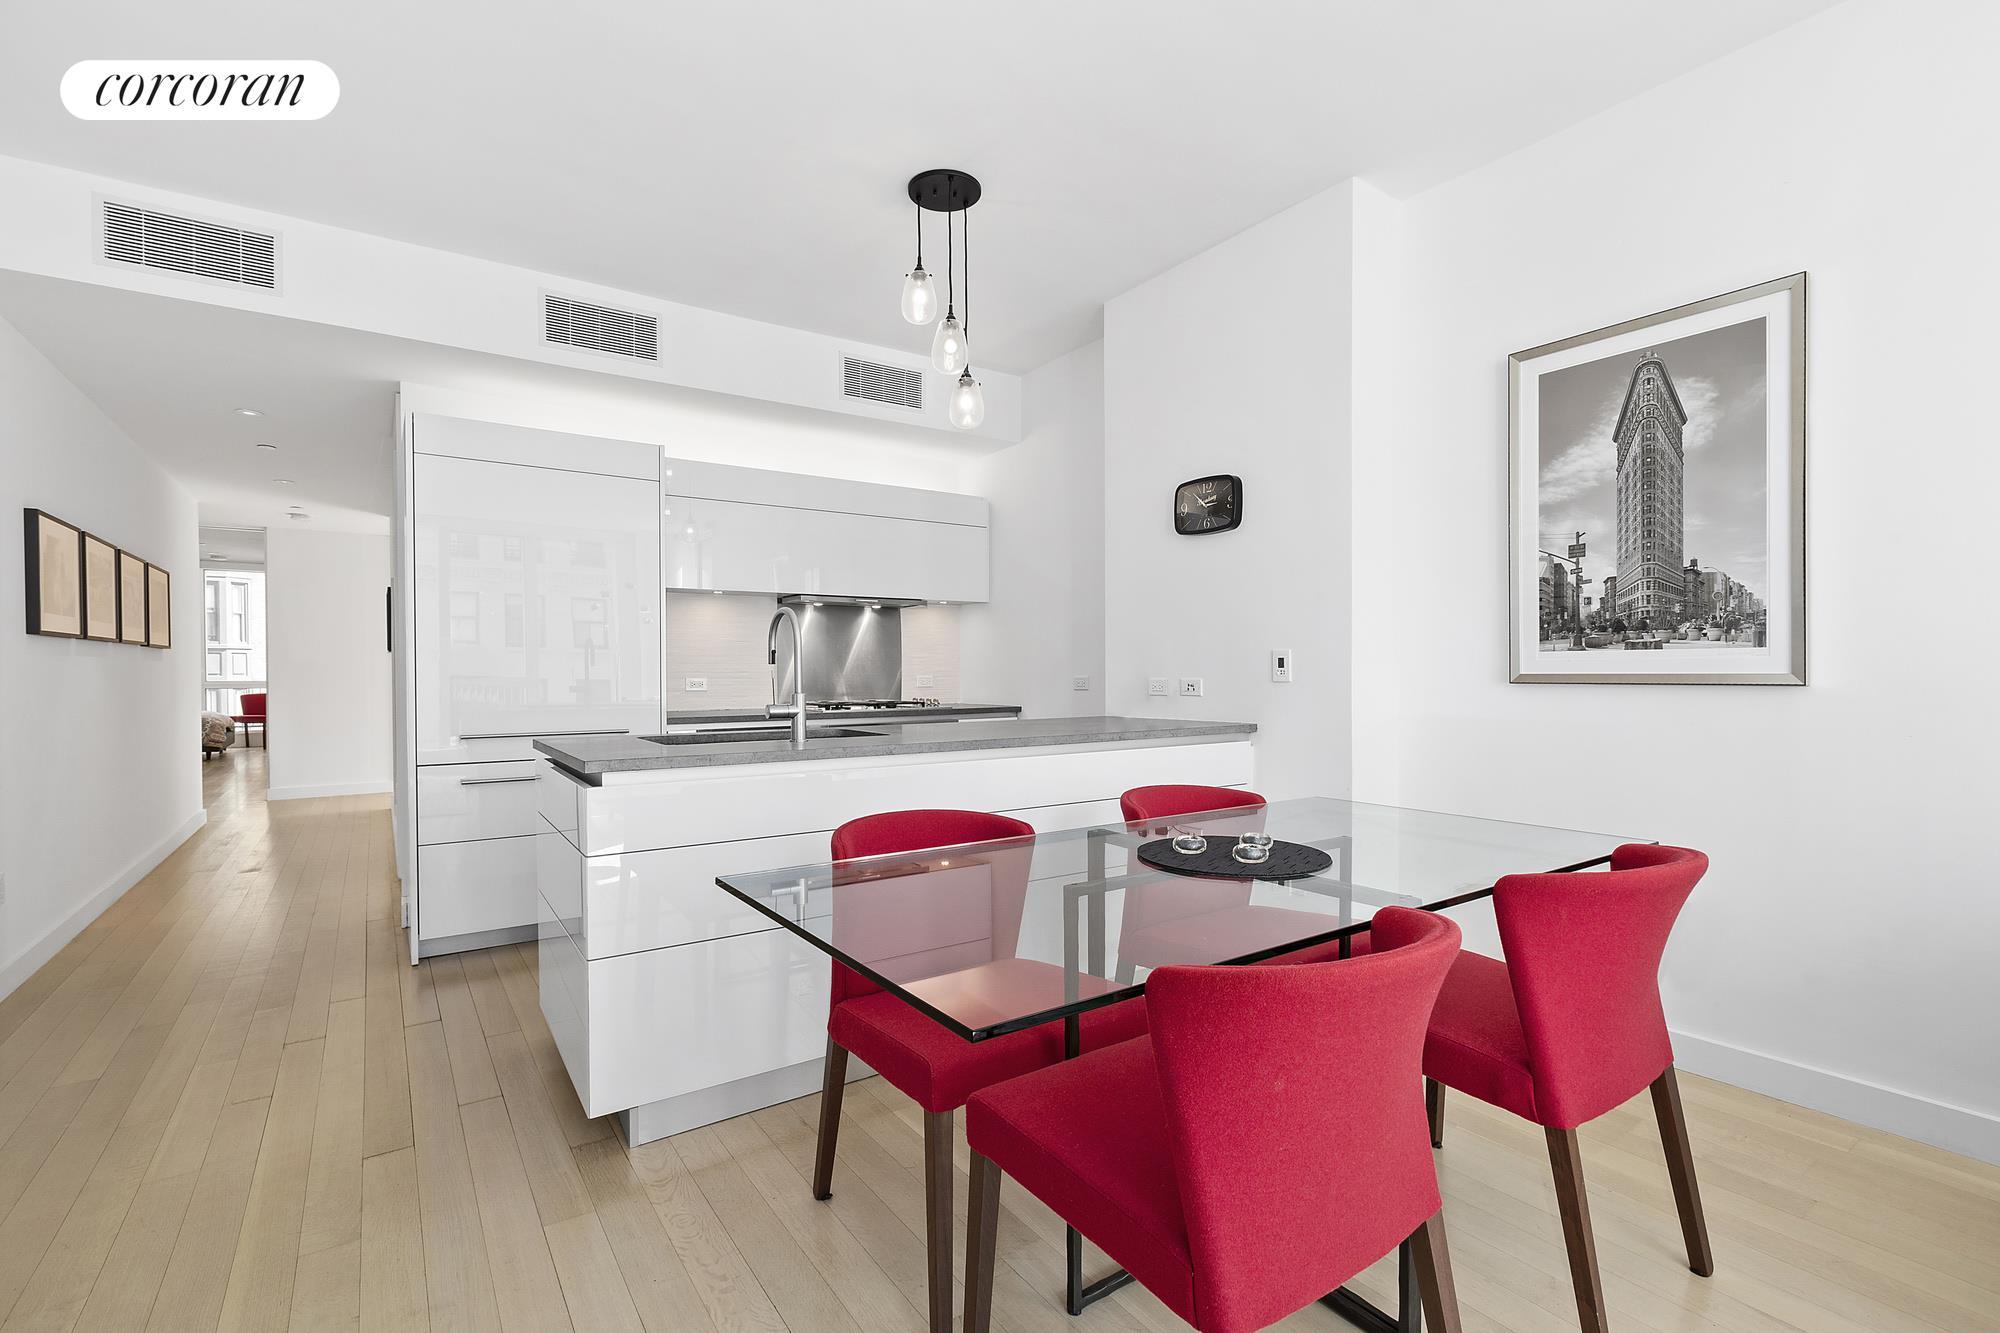 241 Fifth Avenue Flatiron District New York NY 10016